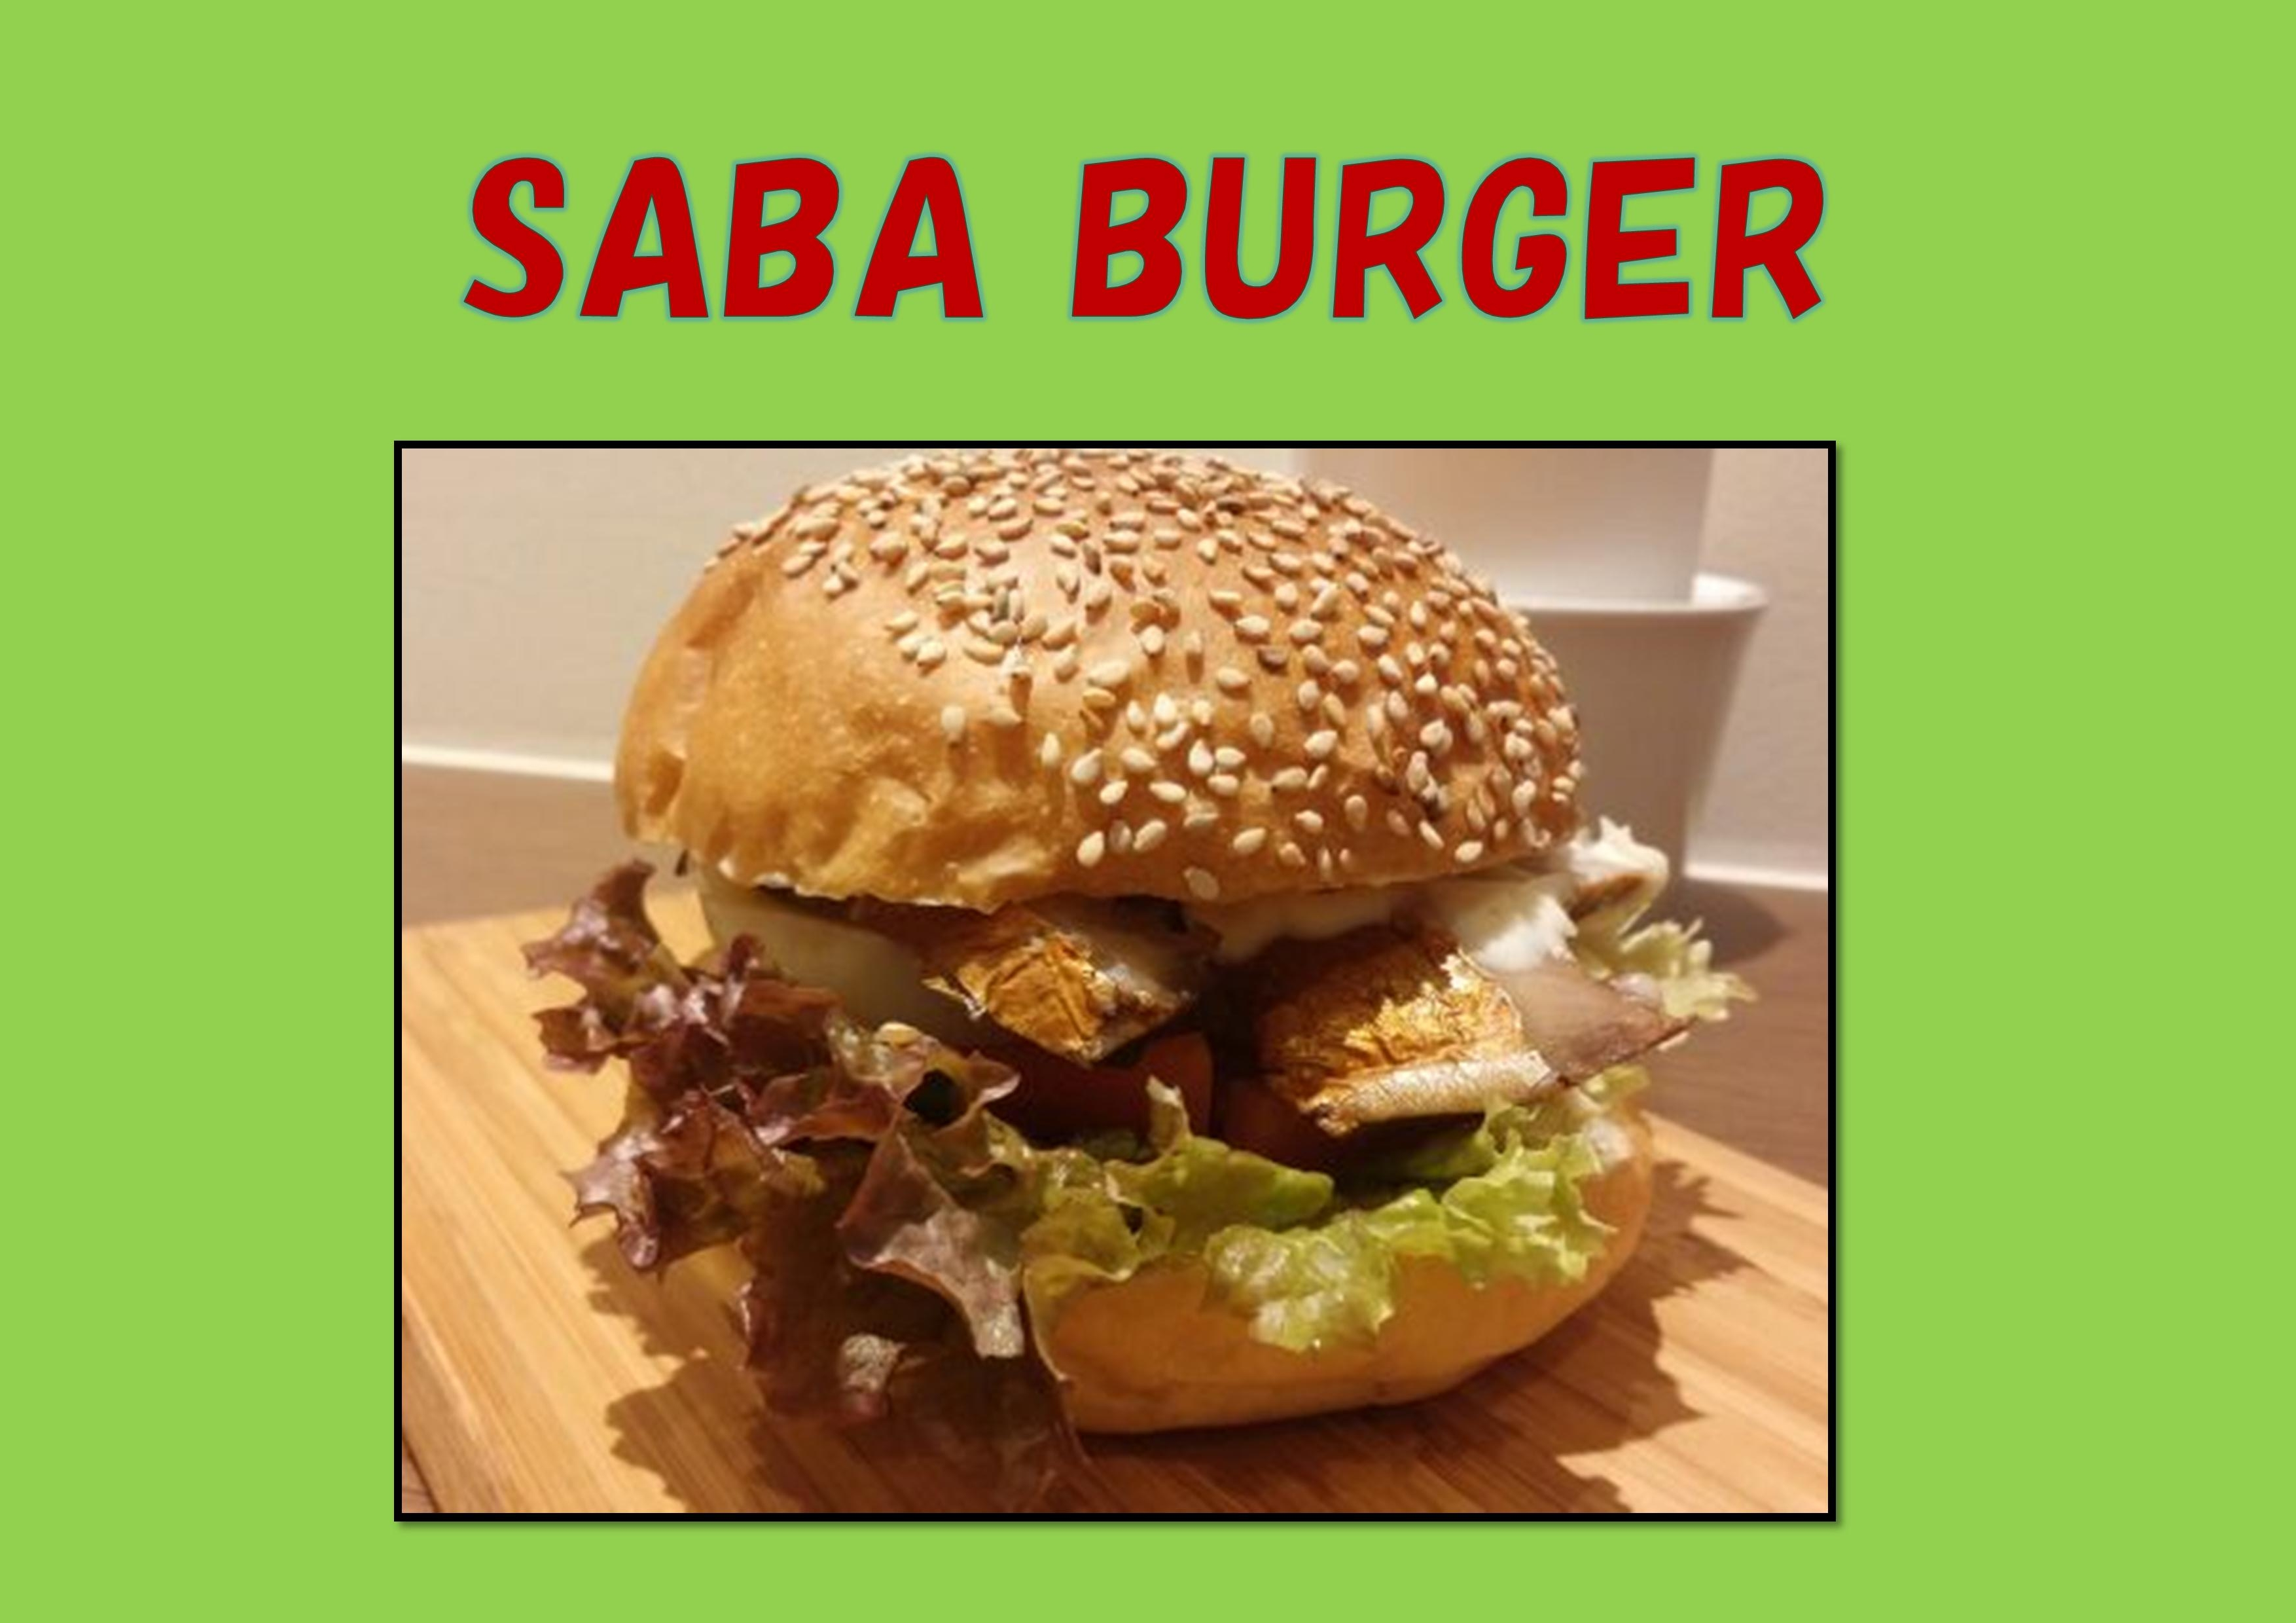 Microsoft Word - SABA BURGER